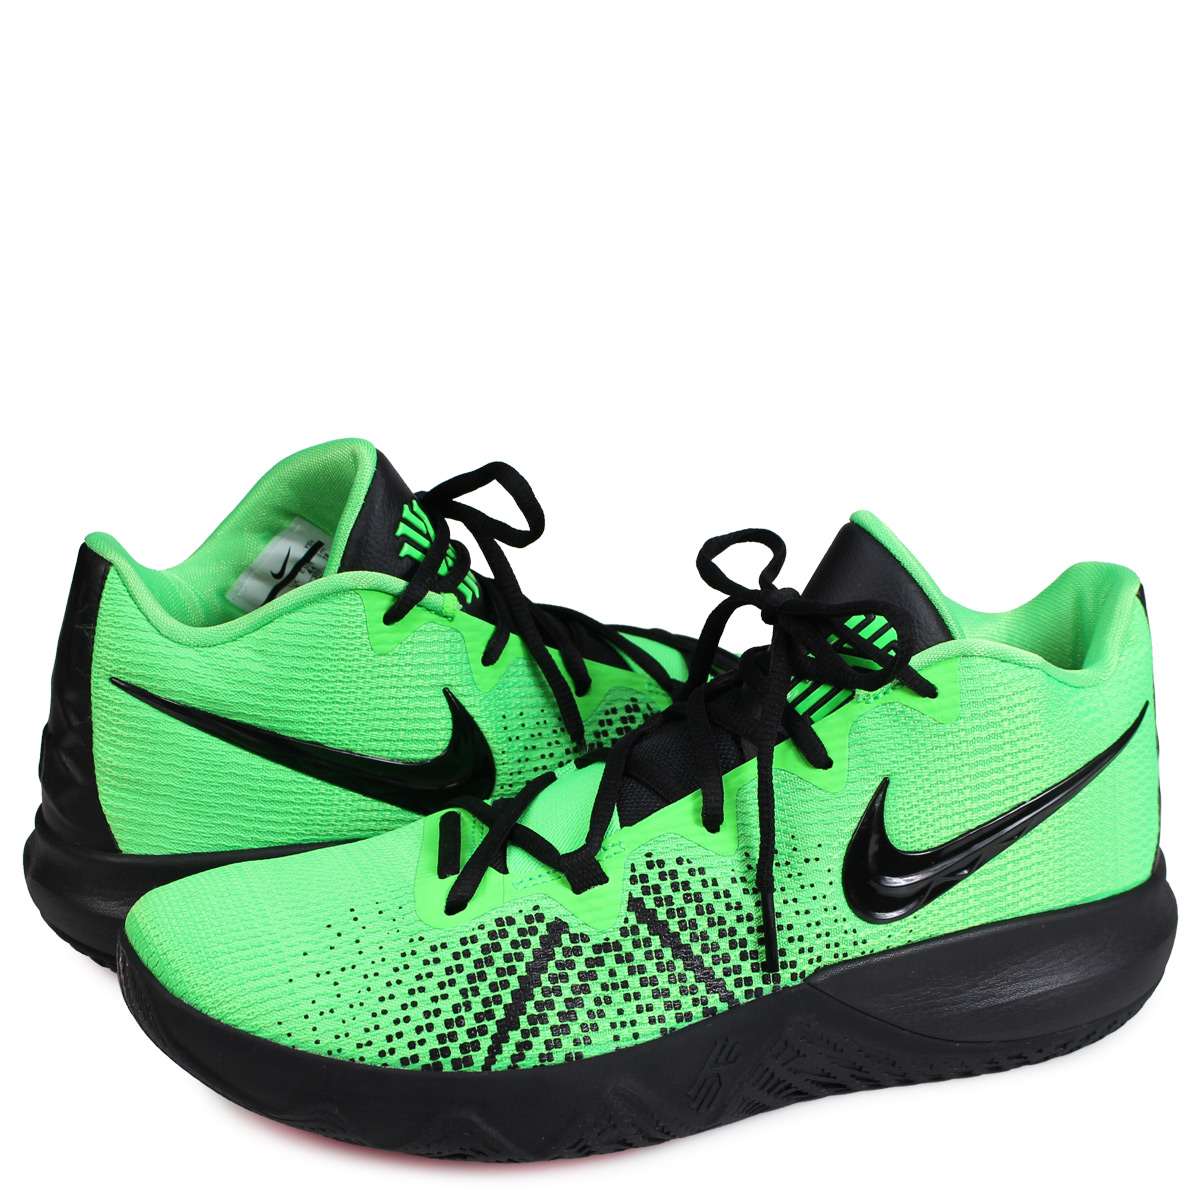 innovative design 1fa6d 35825 Nike NIKE chi leaf rat lap sneakers men KYRIE FLYTRAP green AA7071-300